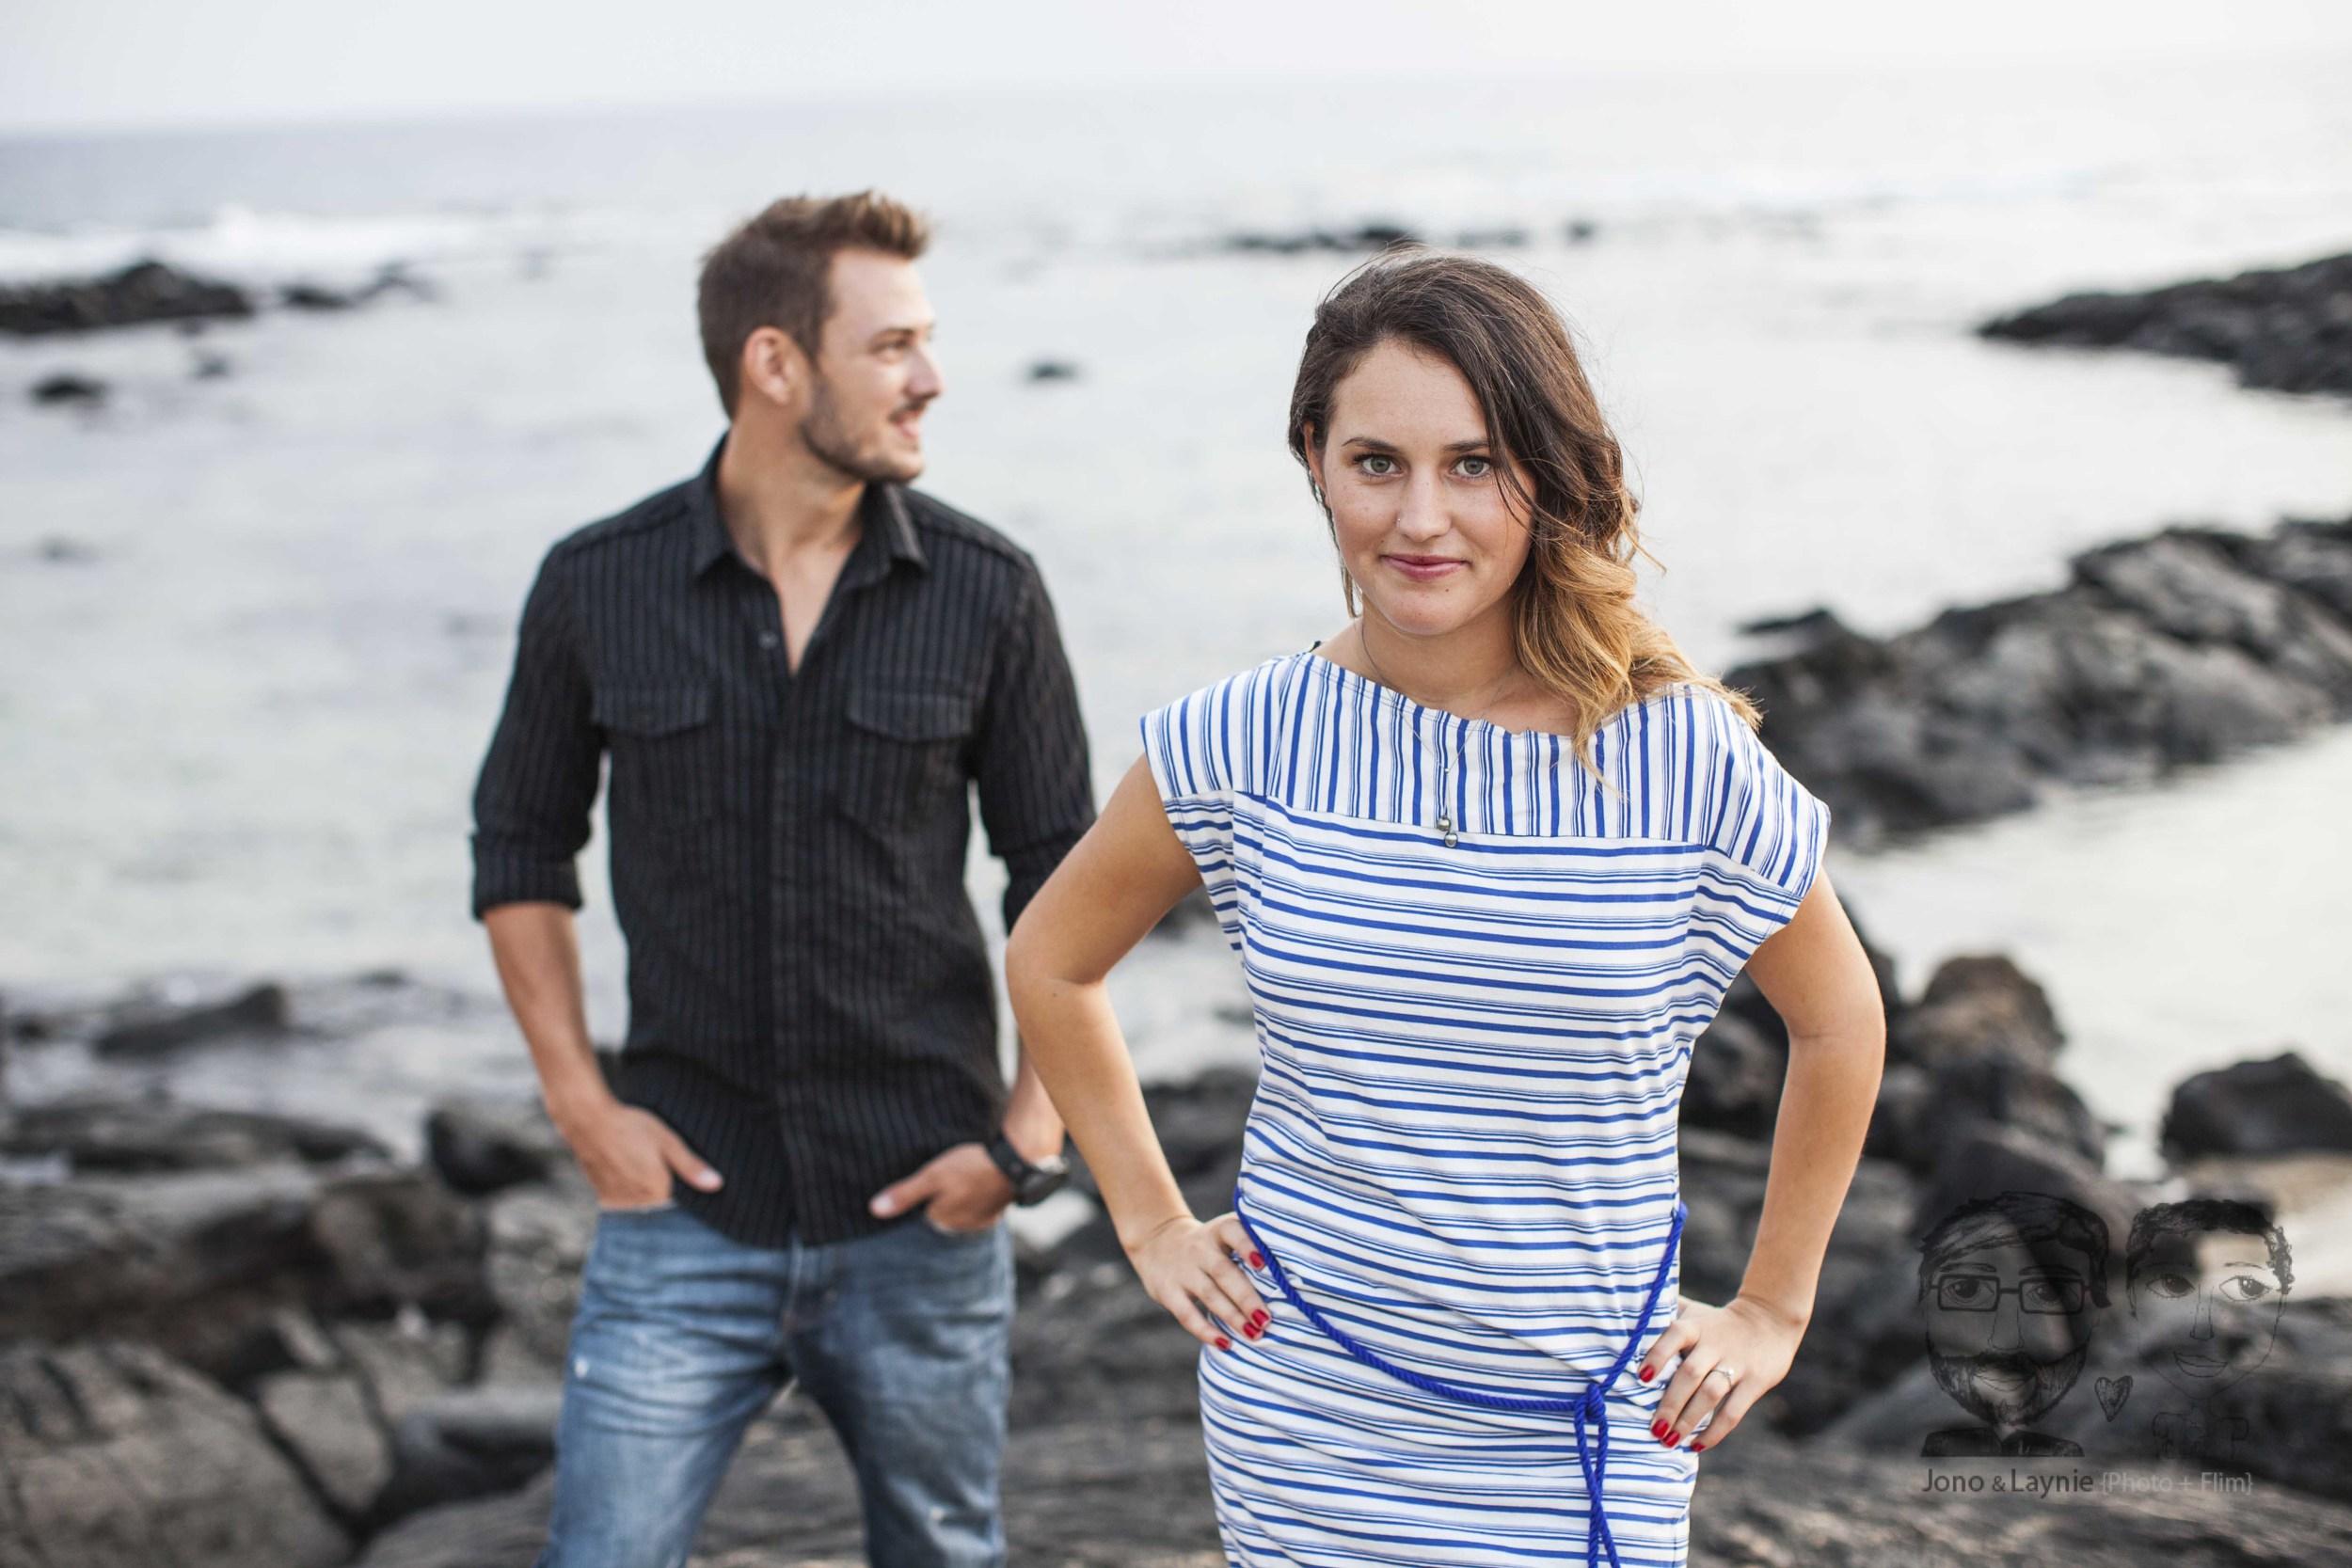 Jono & Laynie Co.-Kona, Hawaii-Engagement Session28.jpg